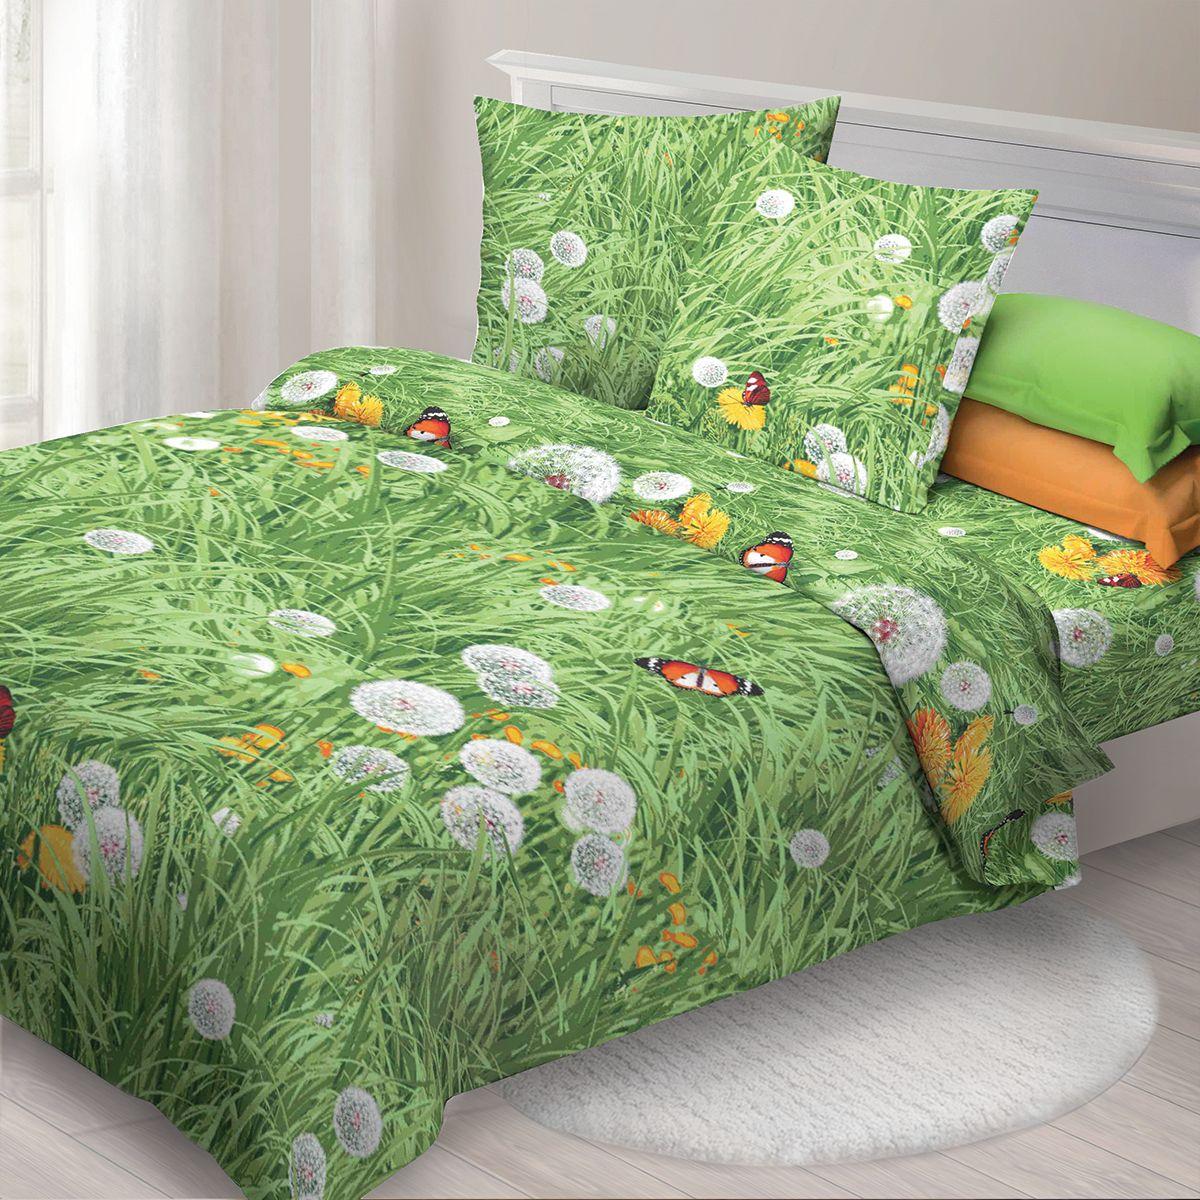 Комплект белья Спал Спалыч Одуванчики, евро, наволочки 70x70, цвет: зеленый. 3619-184199